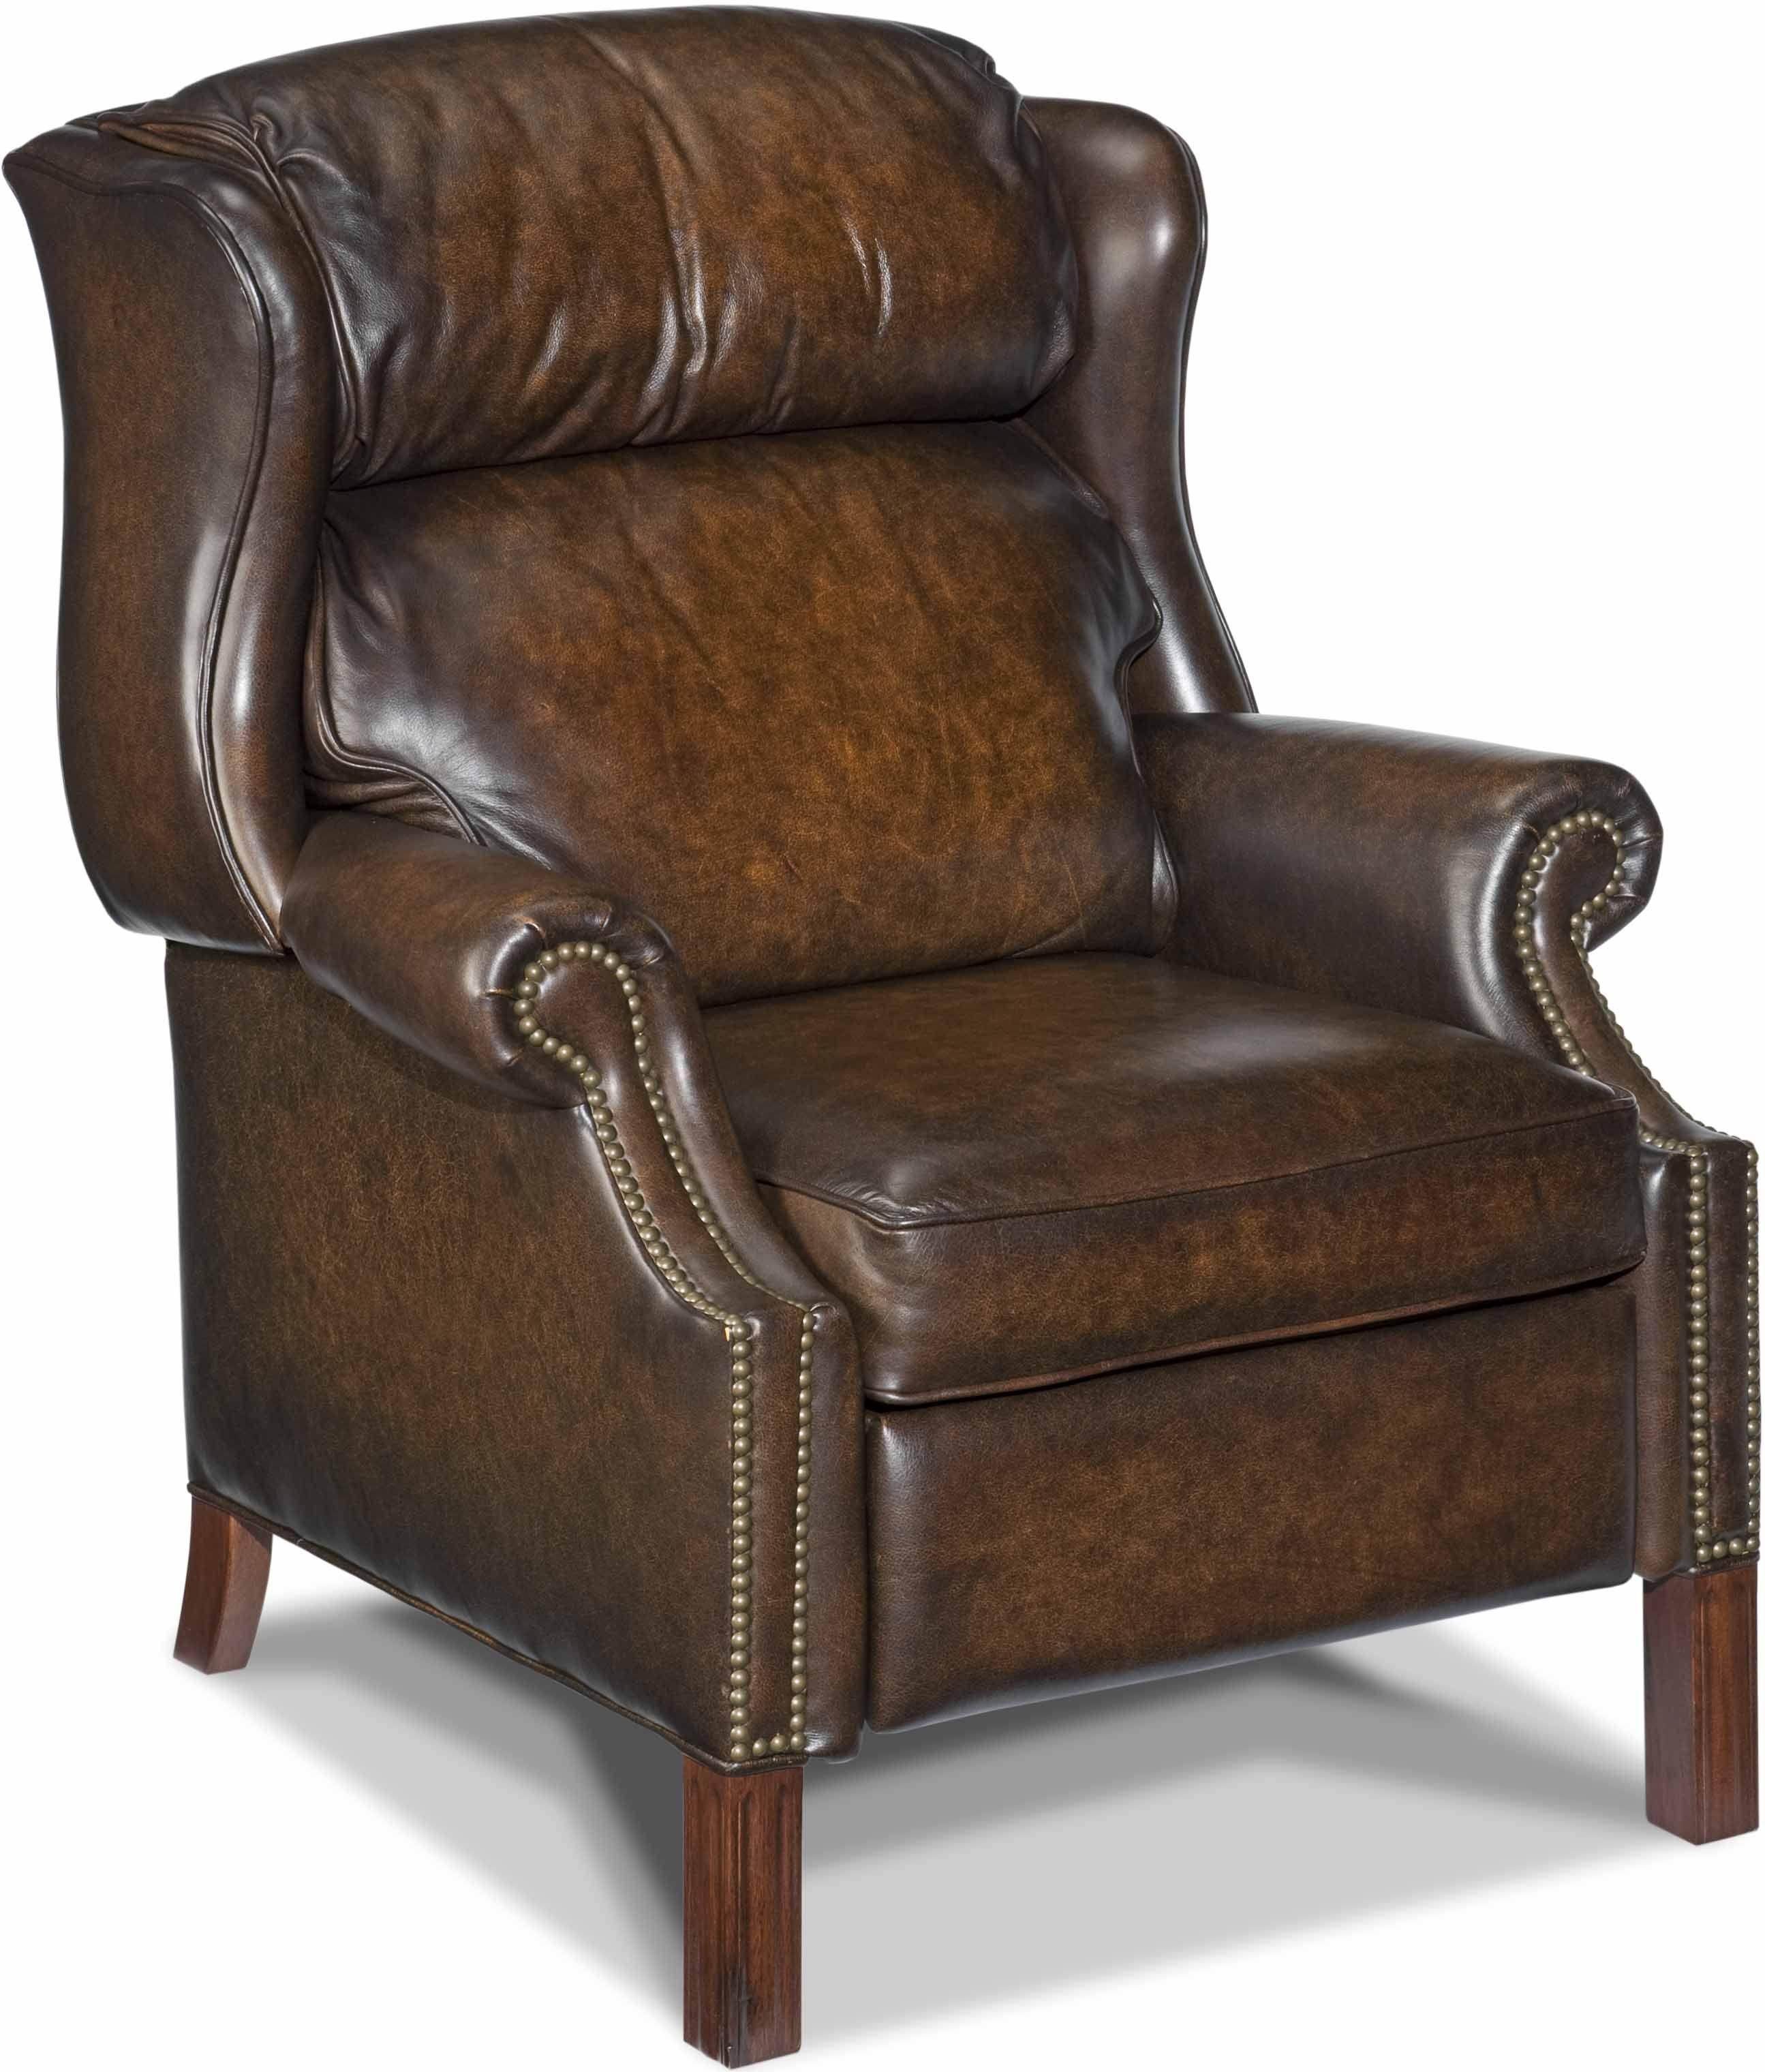 Wondrous By Rc214 Bradington Young Seven Seas Recliner For The Home Spiritservingveterans Wood Chair Design Ideas Spiritservingveteransorg